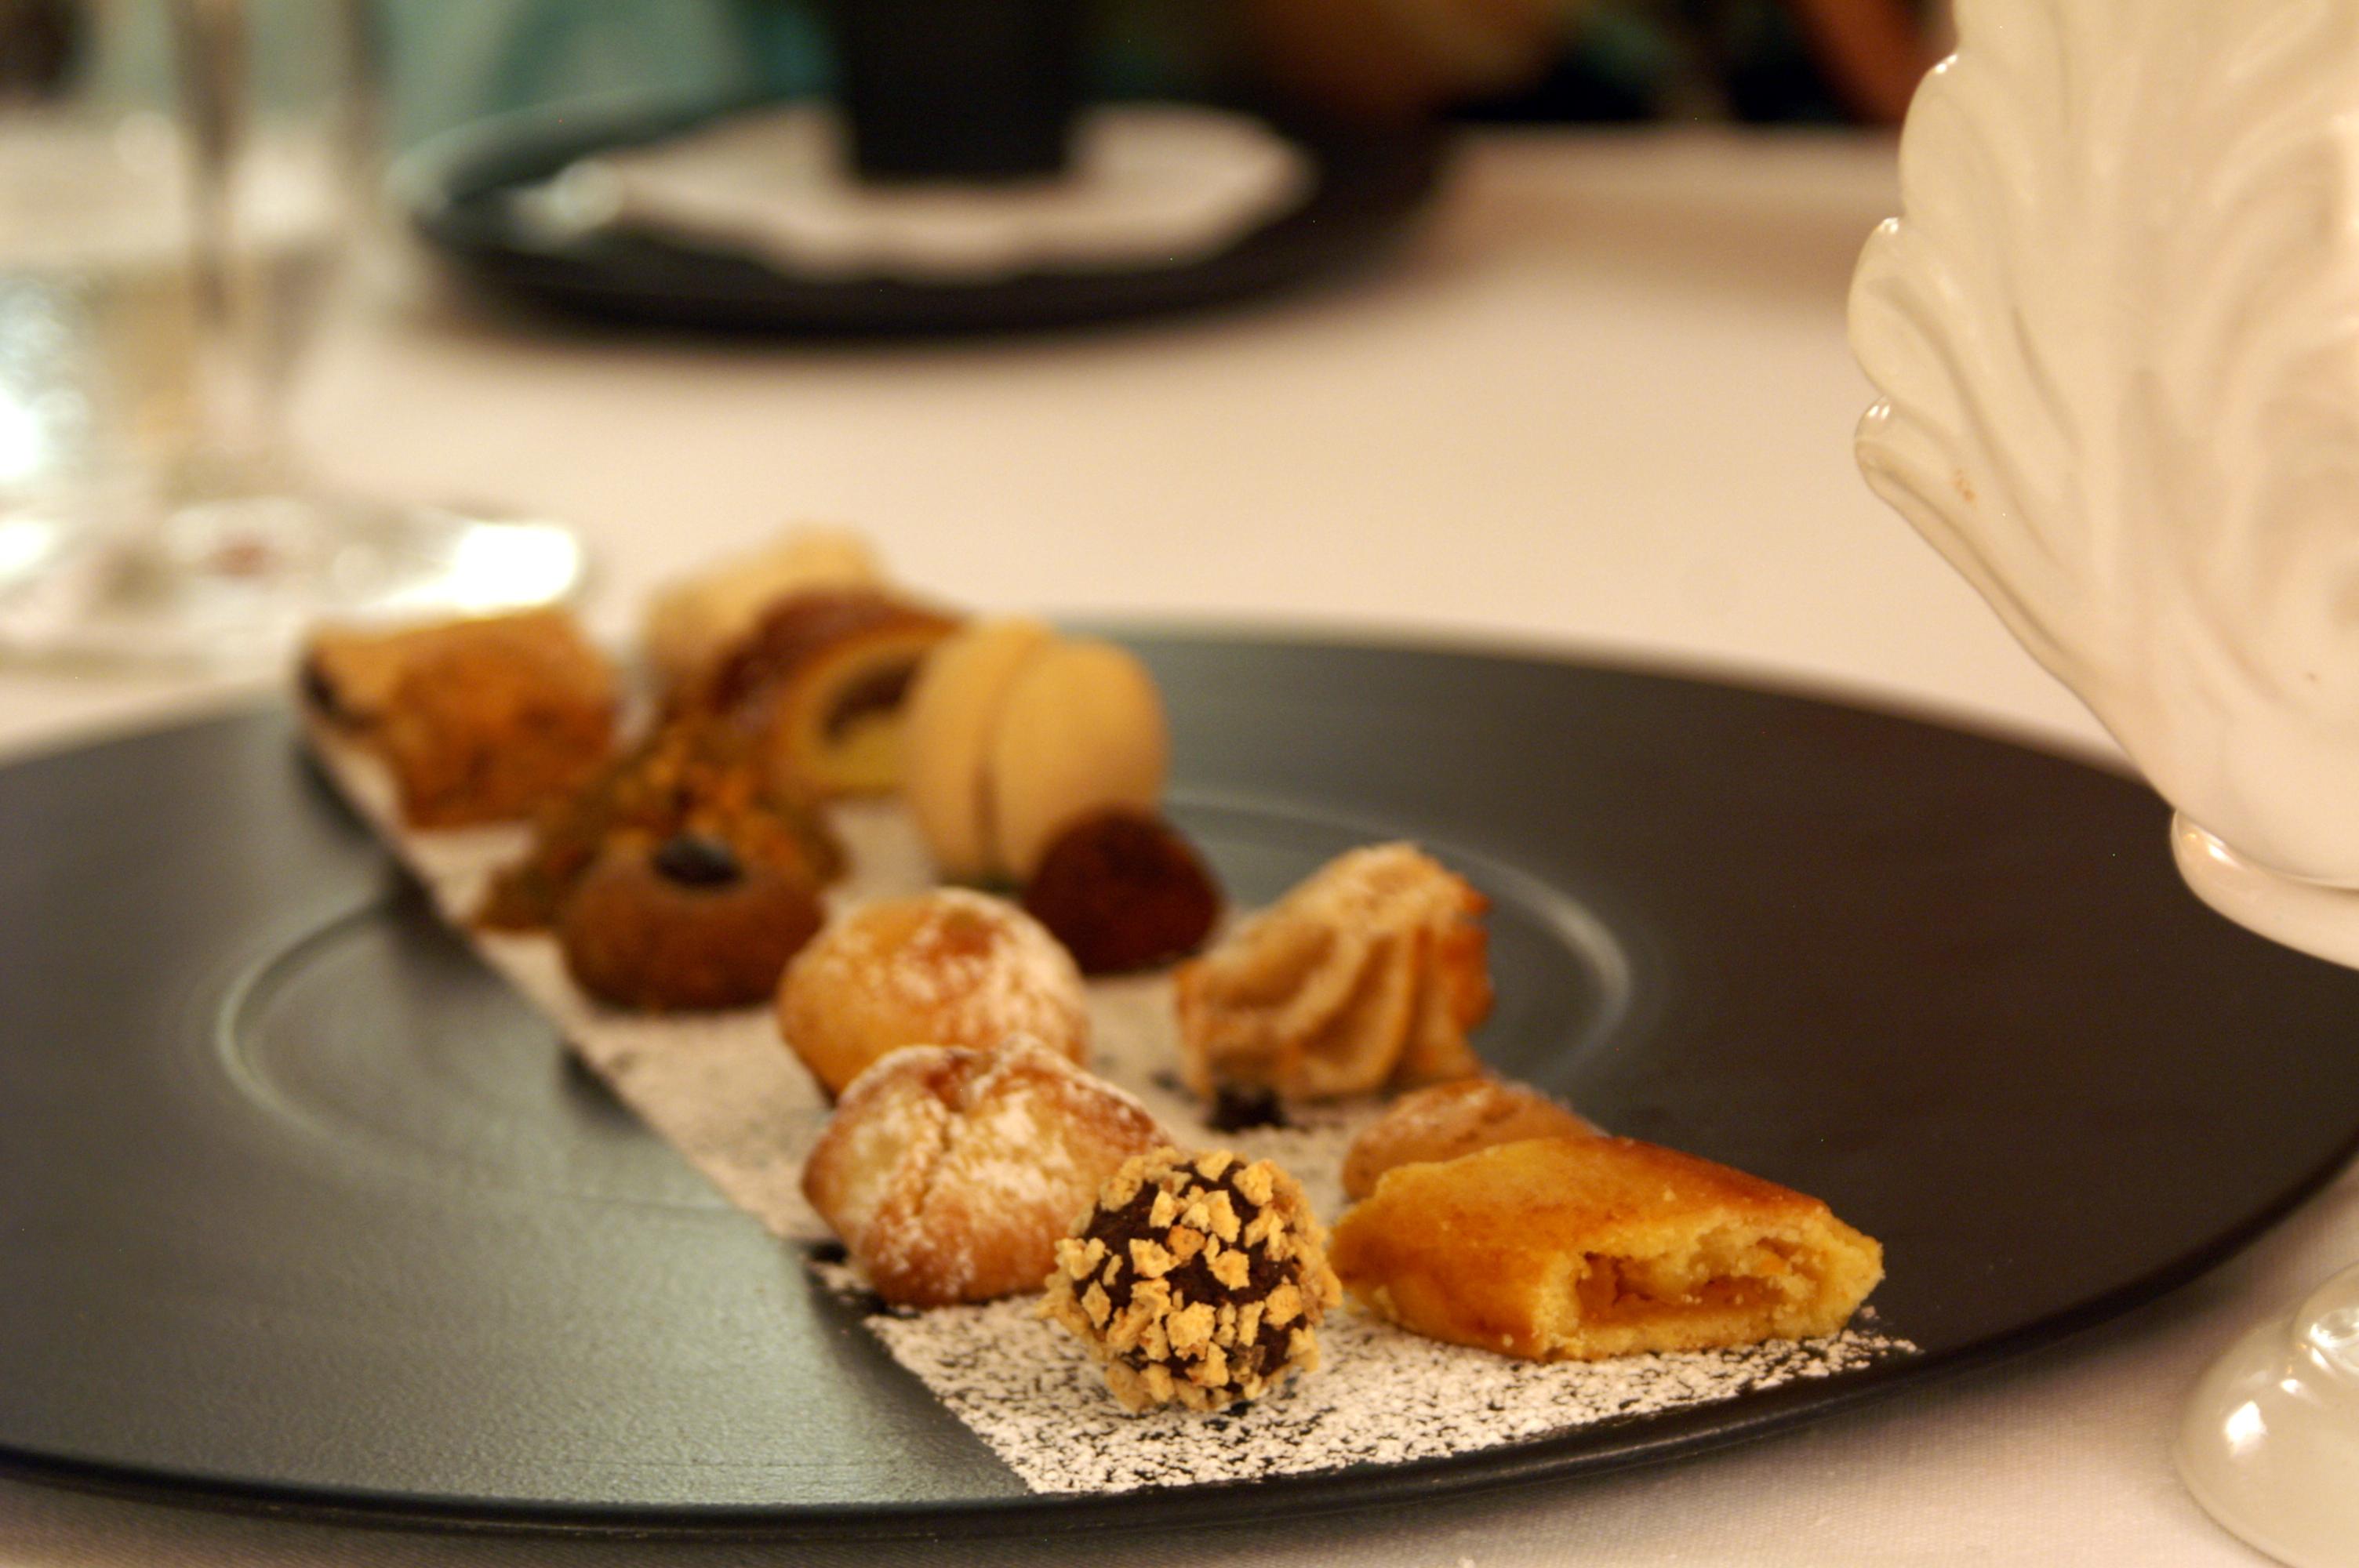 Dessert bisquits plate in La Sommità Relais hotel restaurant